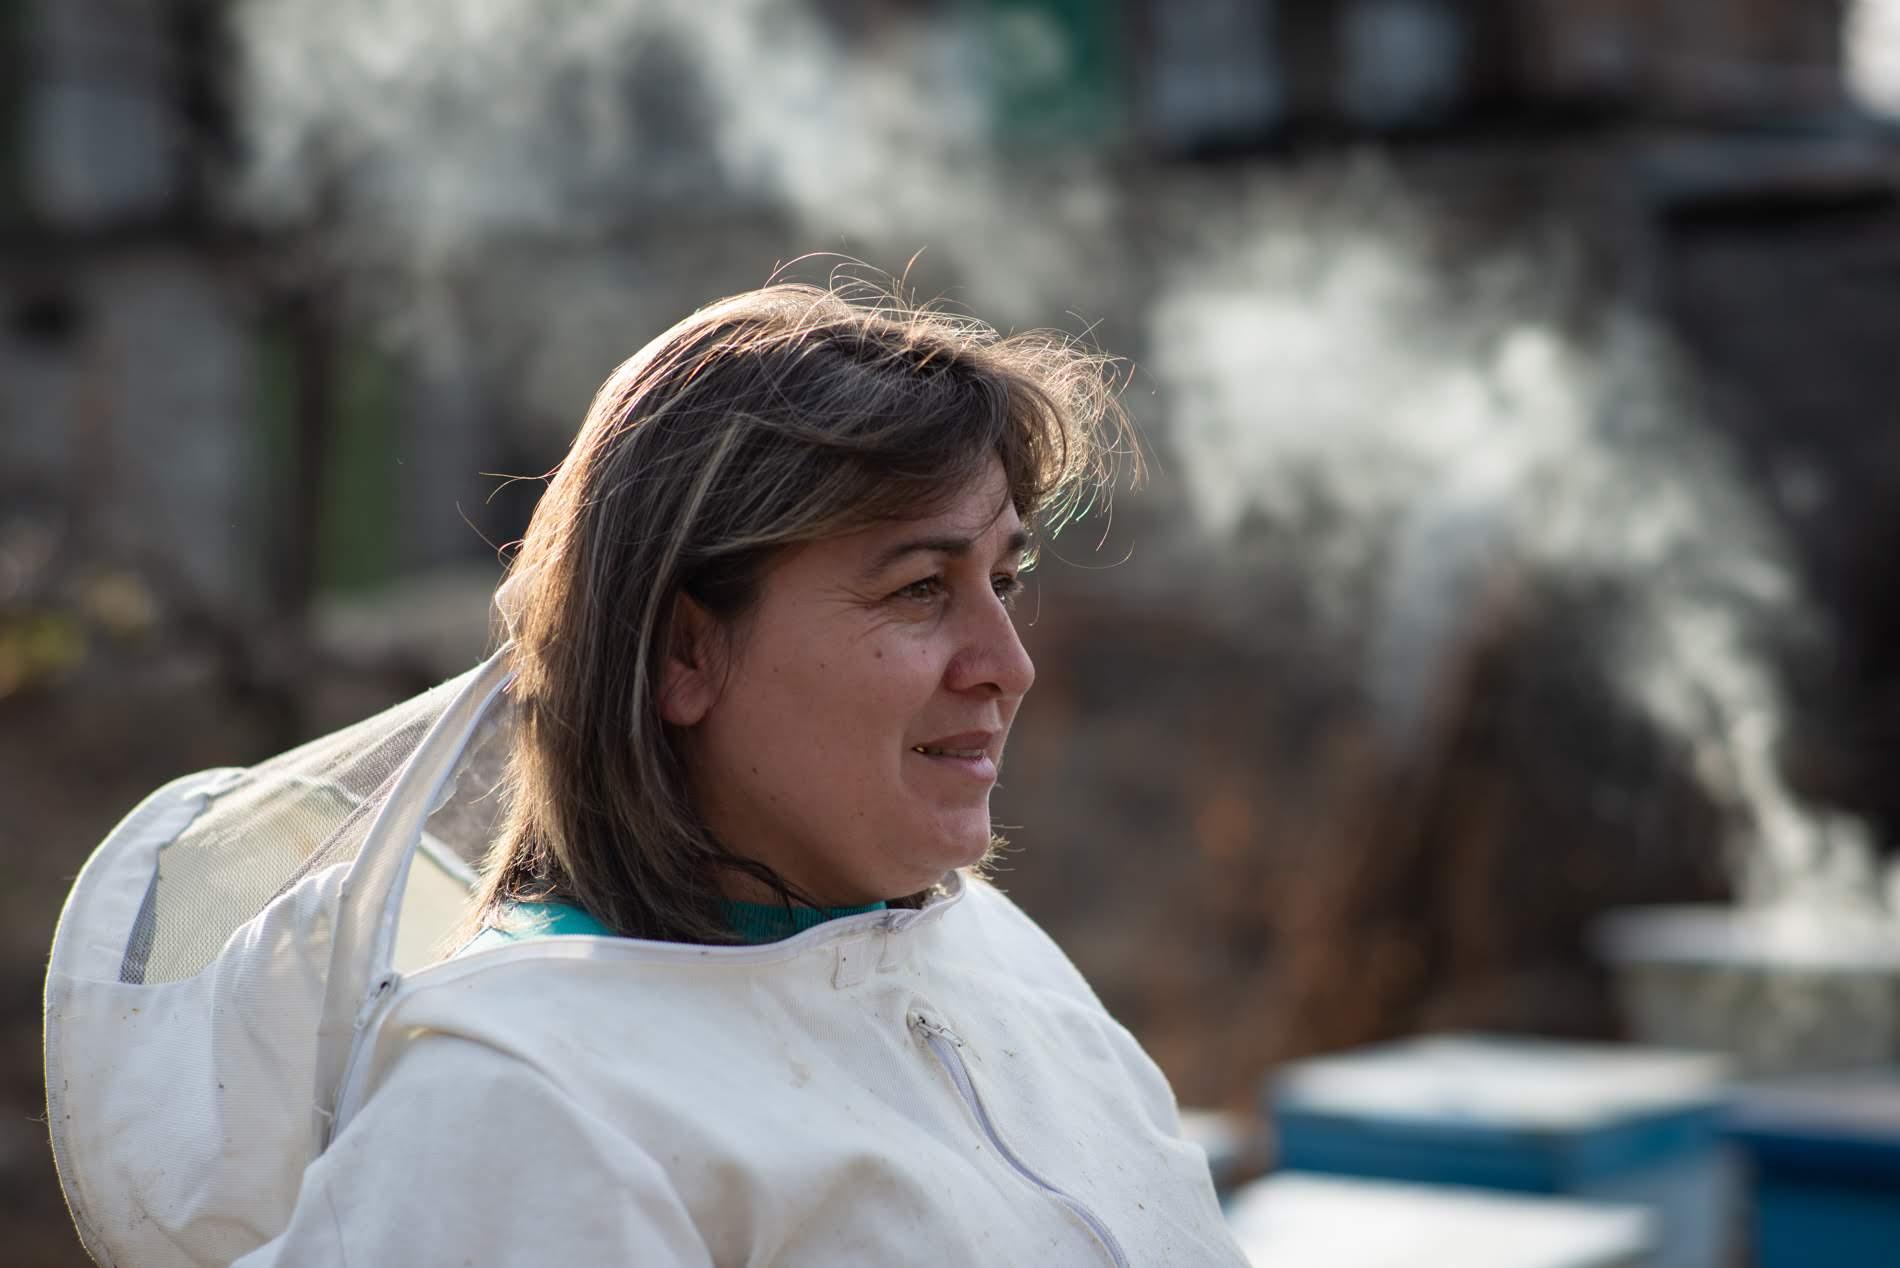 Пчеловодство составляет 20%-30% дохода семьи Кациашвили. Фото: Тамуна Чкареули / OC Media